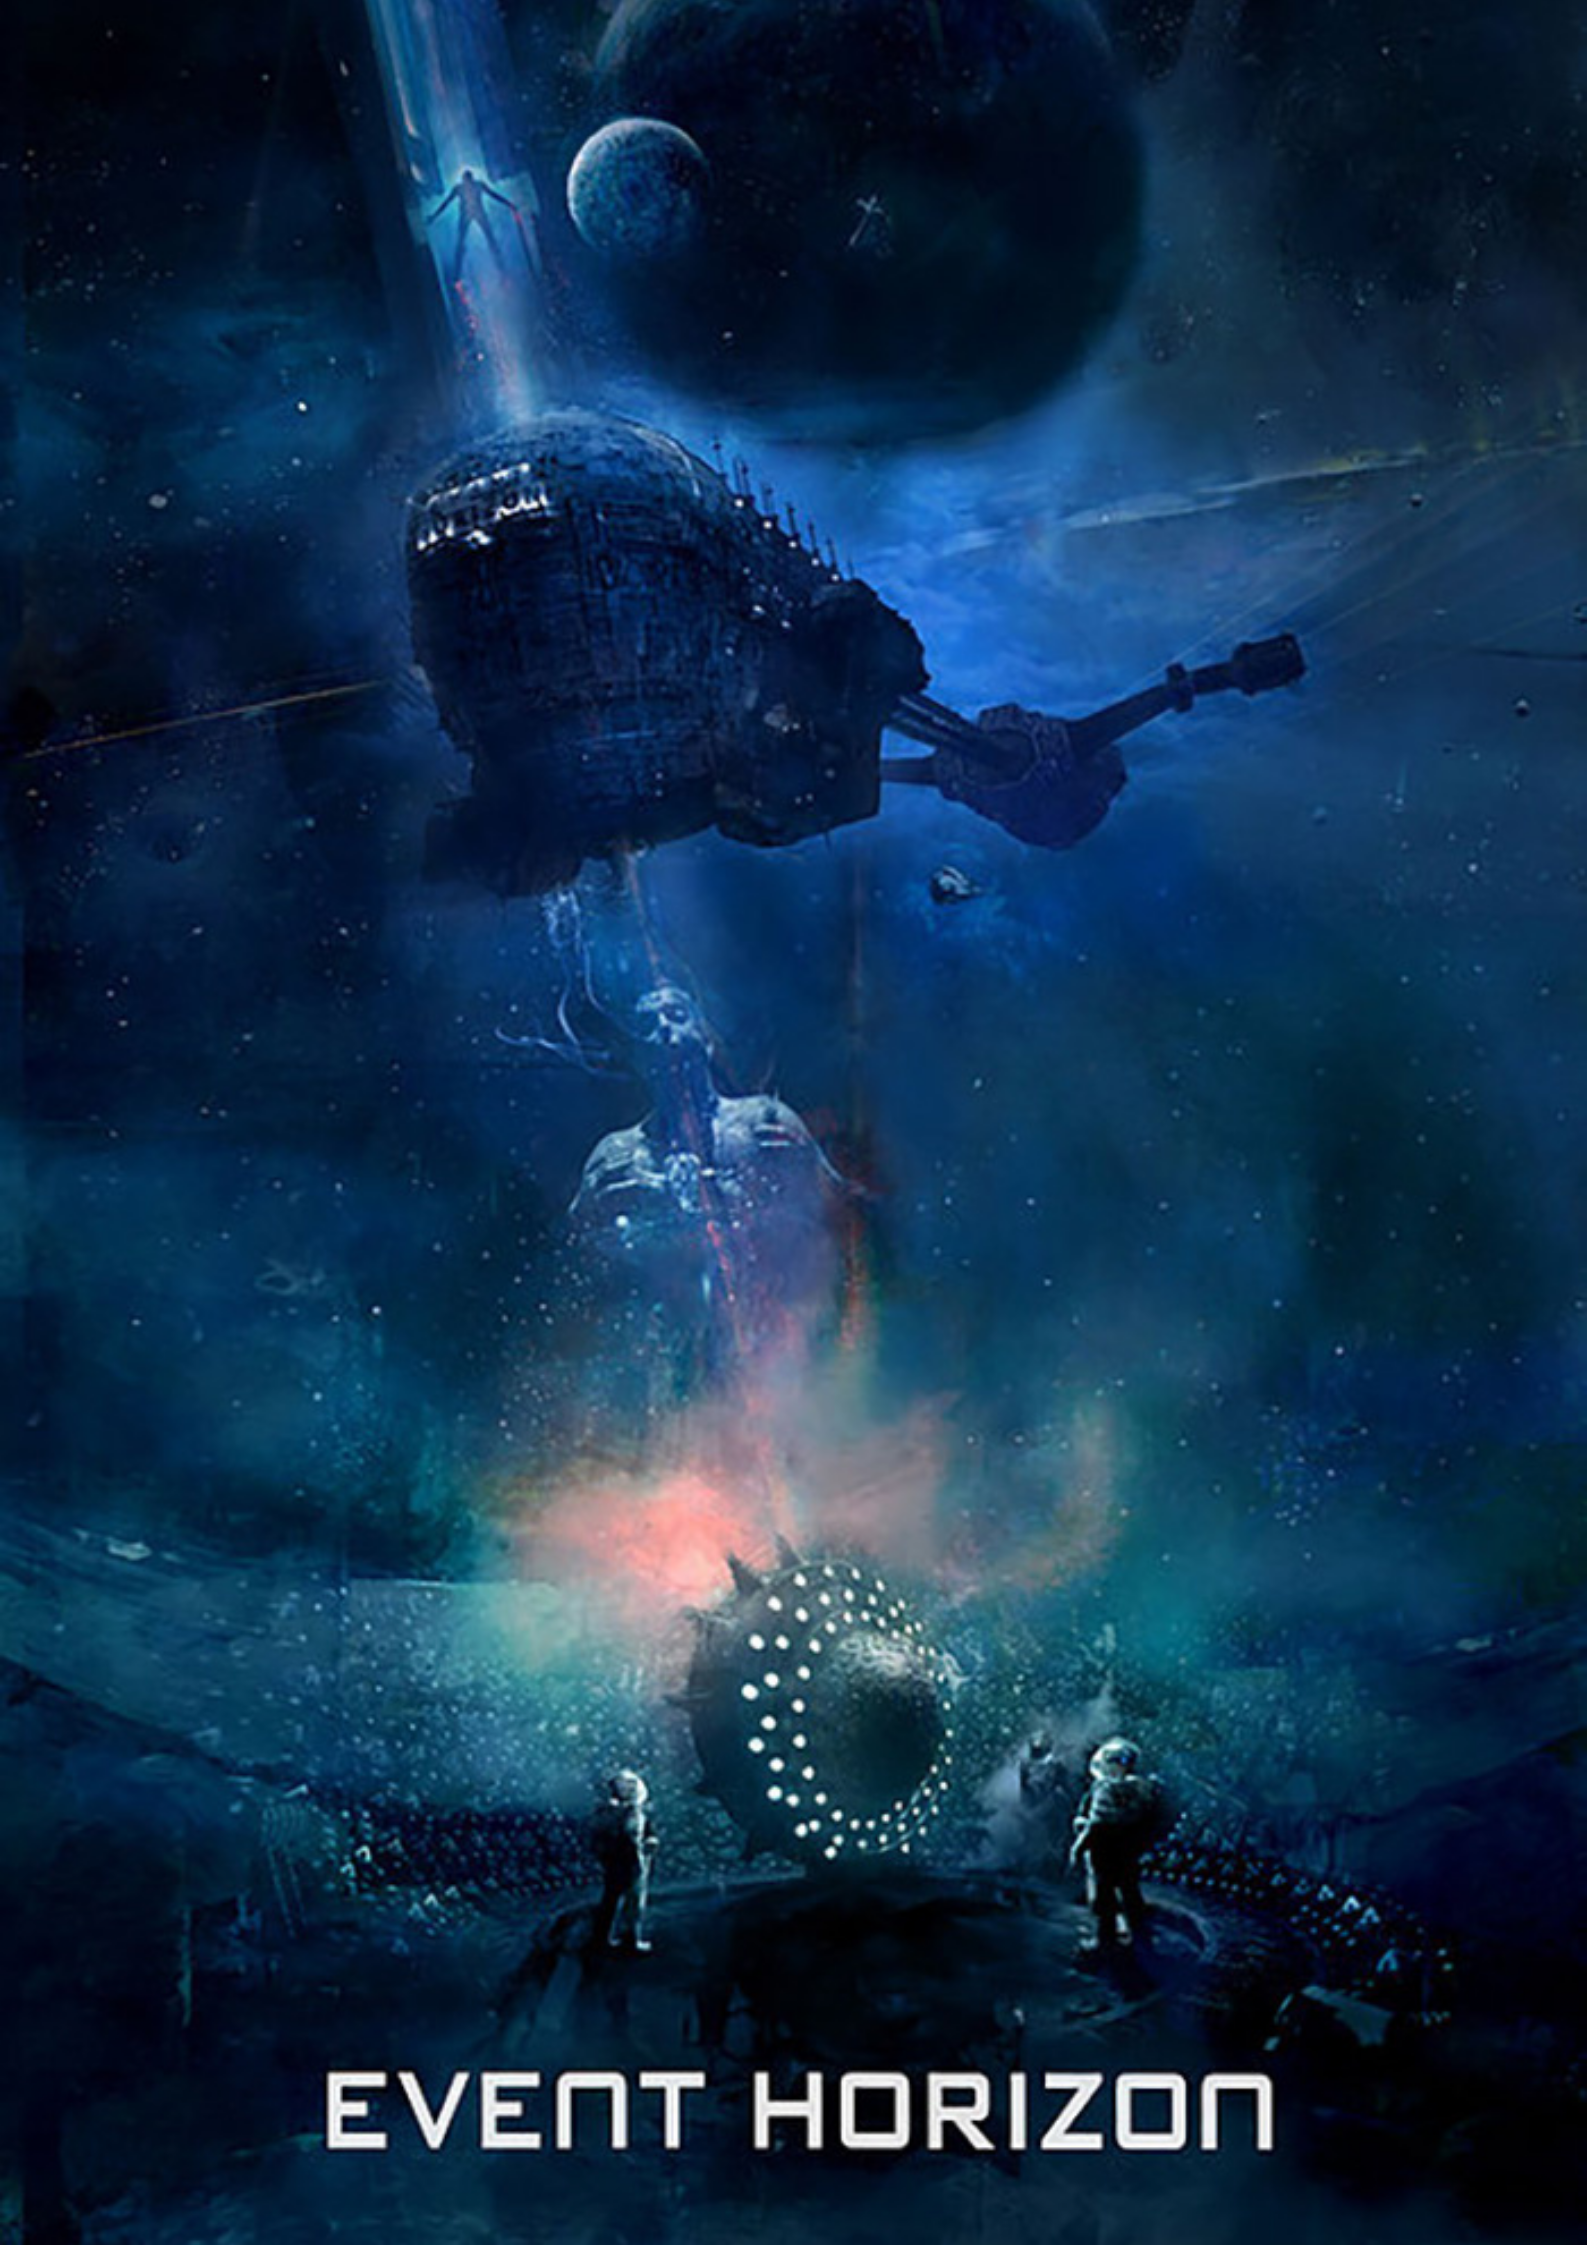 Event Horizon art poster